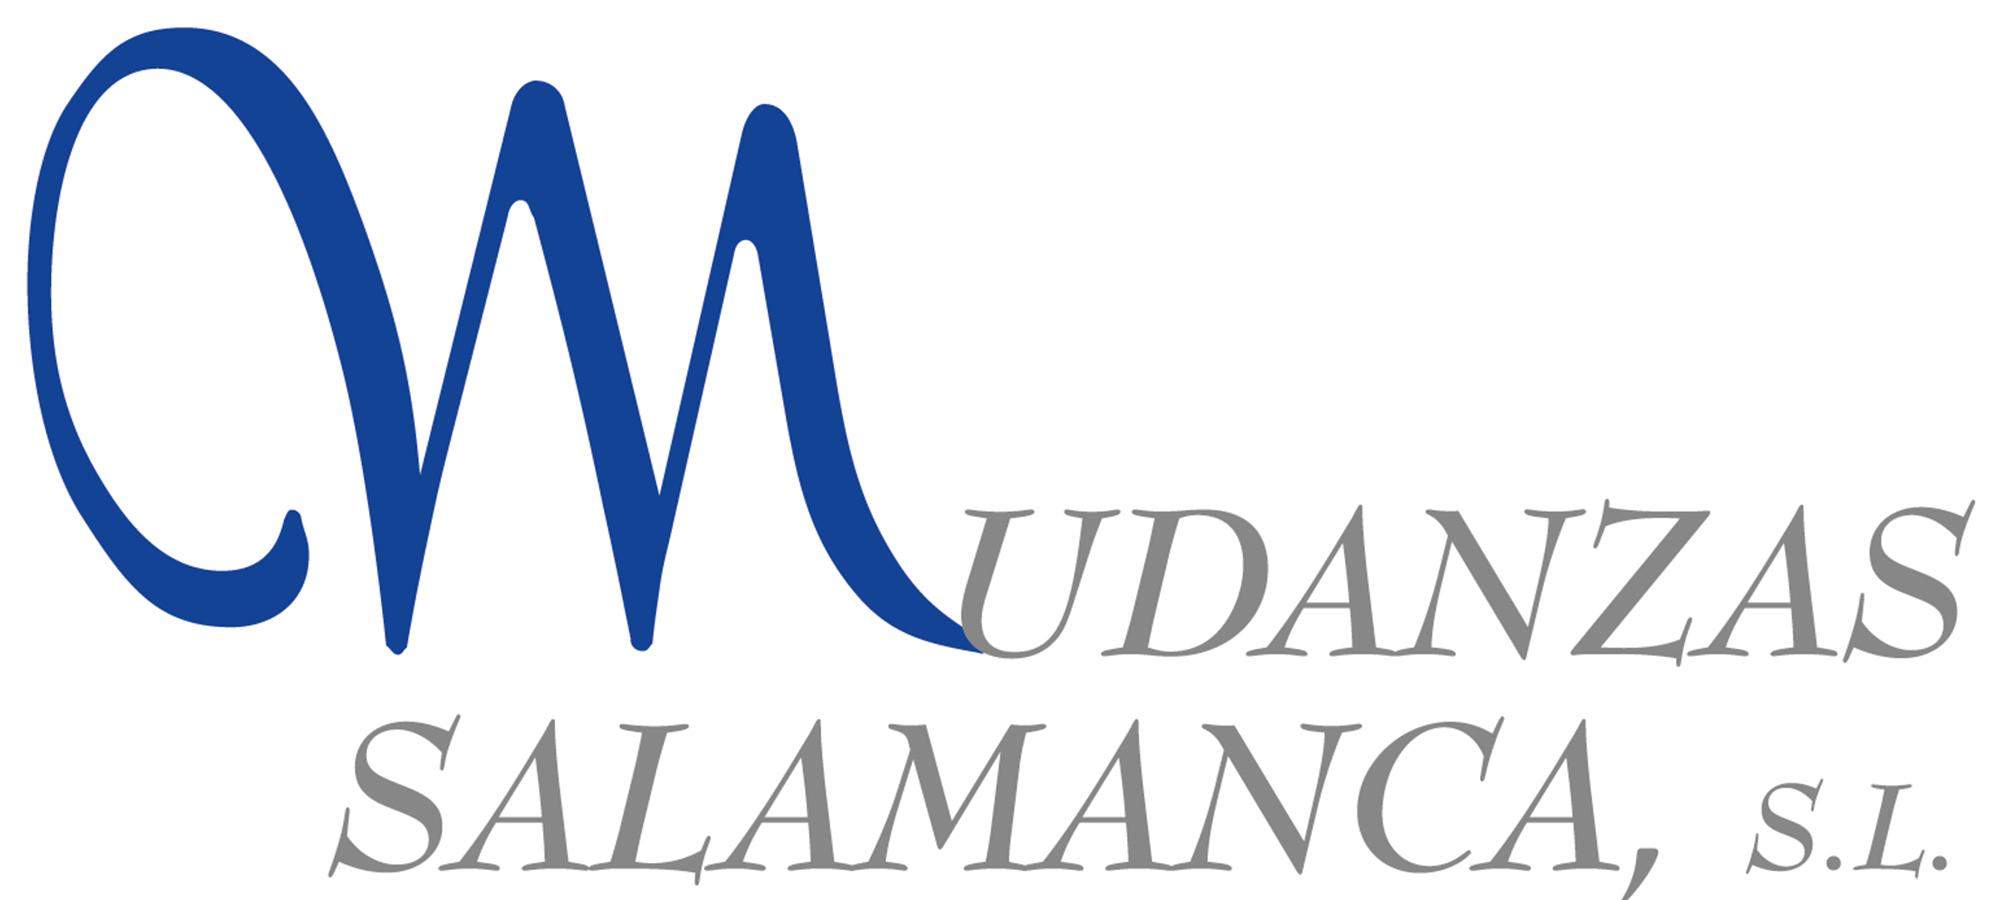 Mudanzas Salamanca